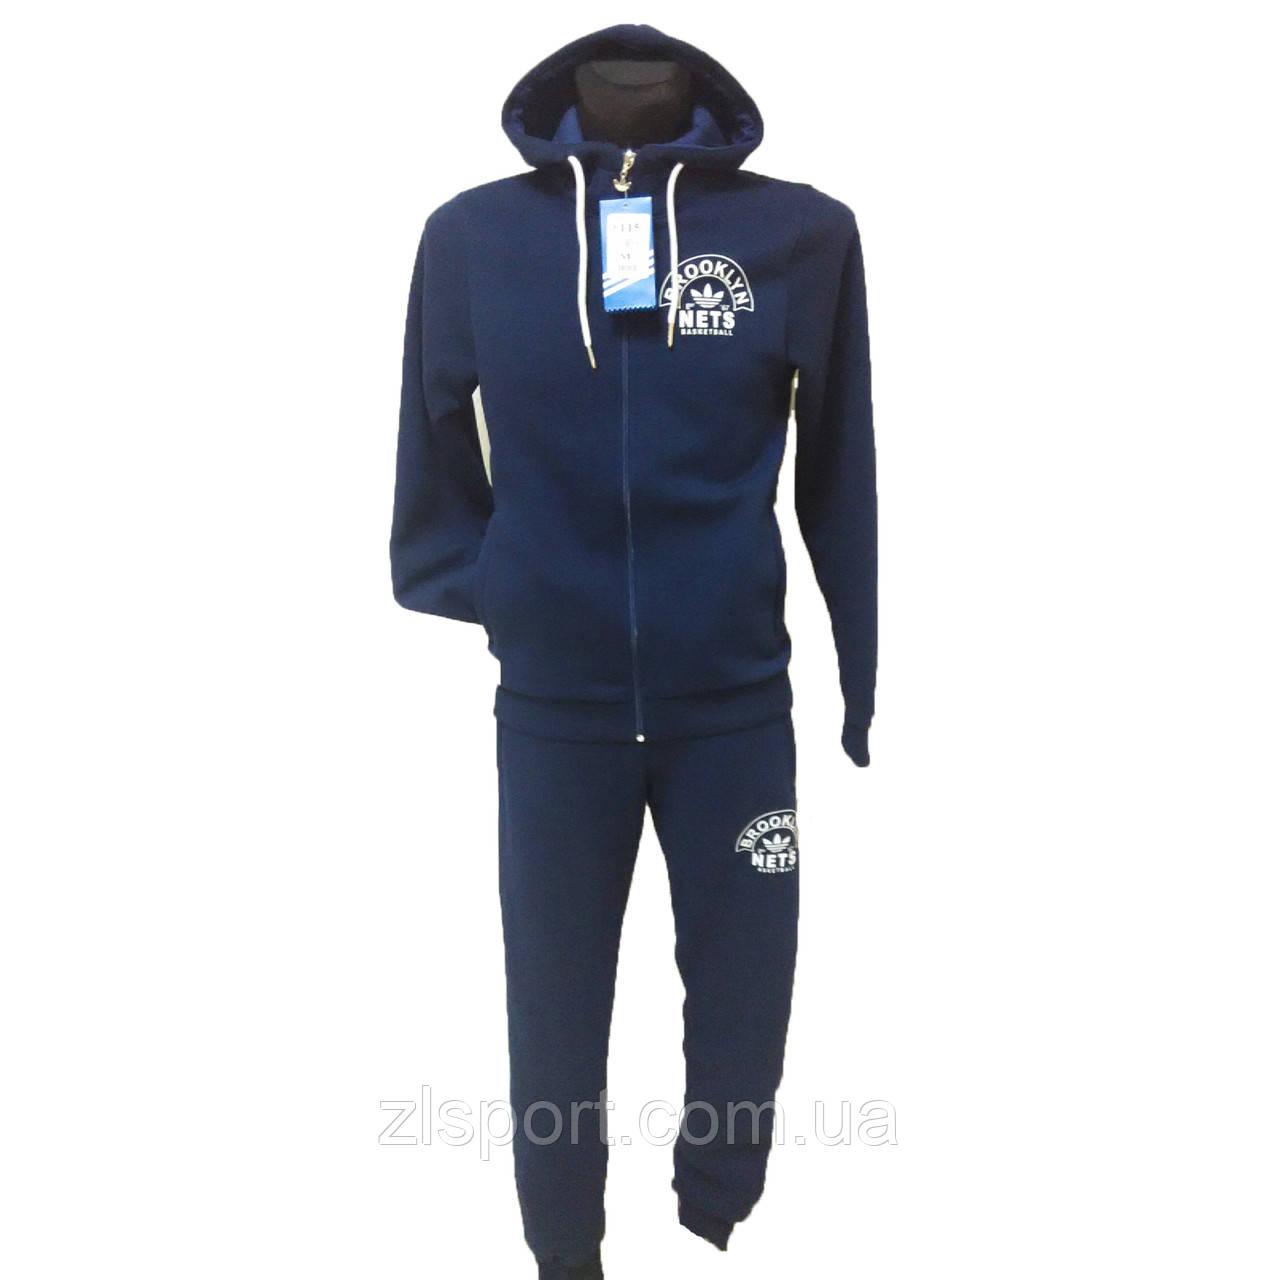 b5cfd4e1 Зимний мужской спортивный костюм Adidas Brooklyn Турция - Интернет магазин  спортивной одежды